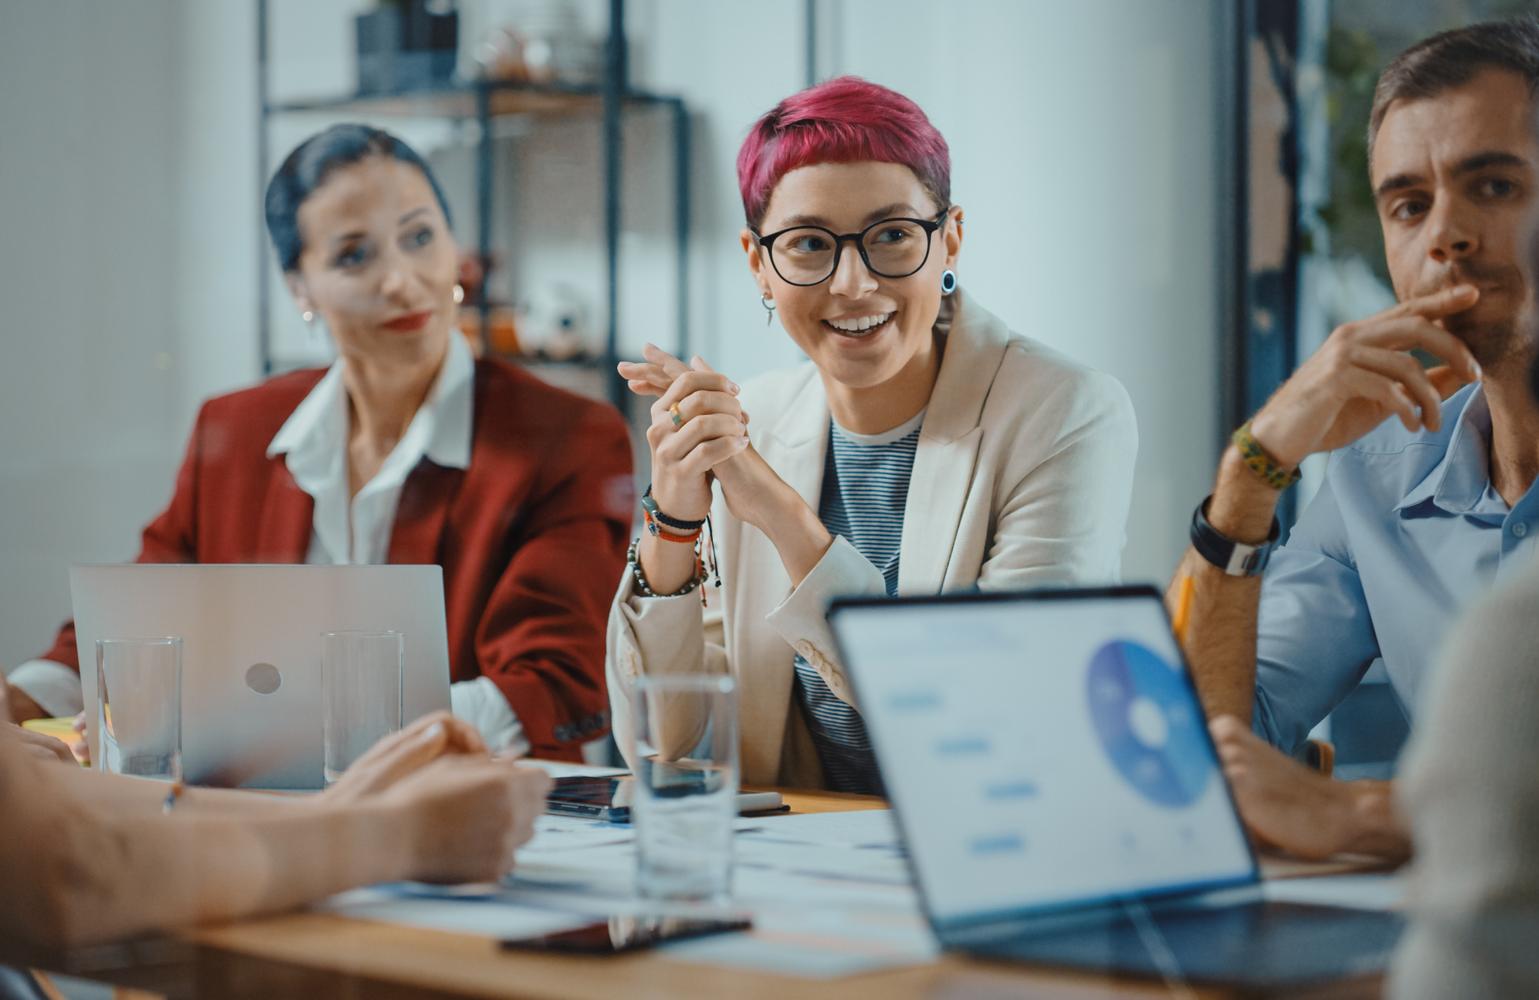 How Customer Support Helps Build Brands